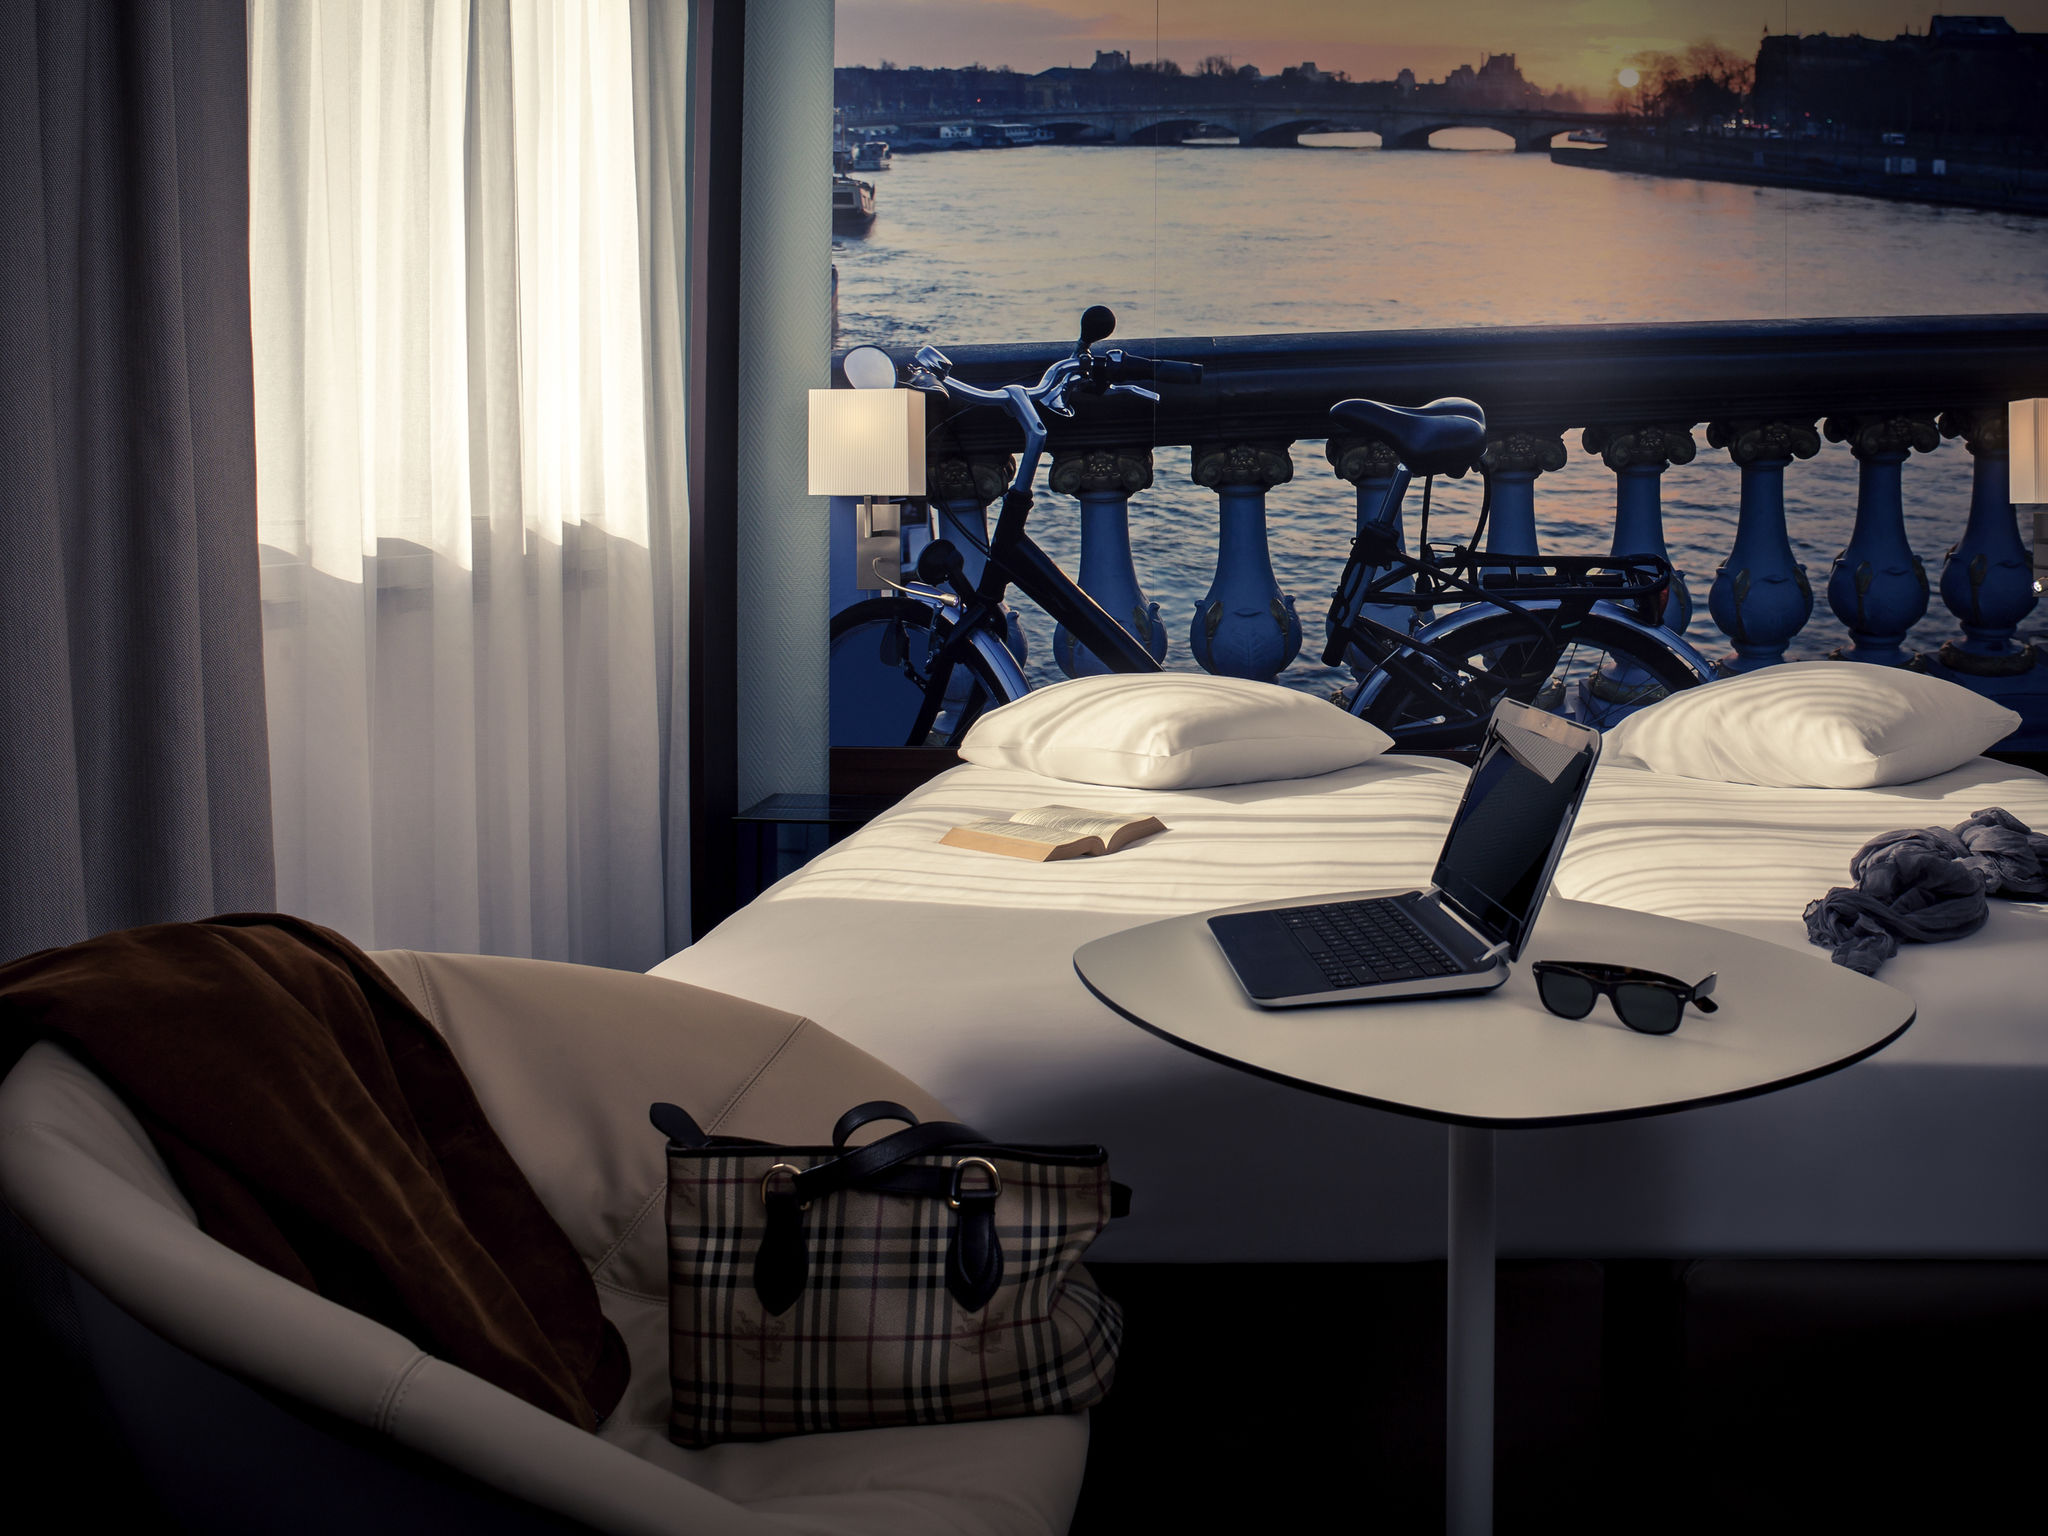 Hotel mercure paris ivry quai de seine hotel with code - Ivry sur seine code postal ...